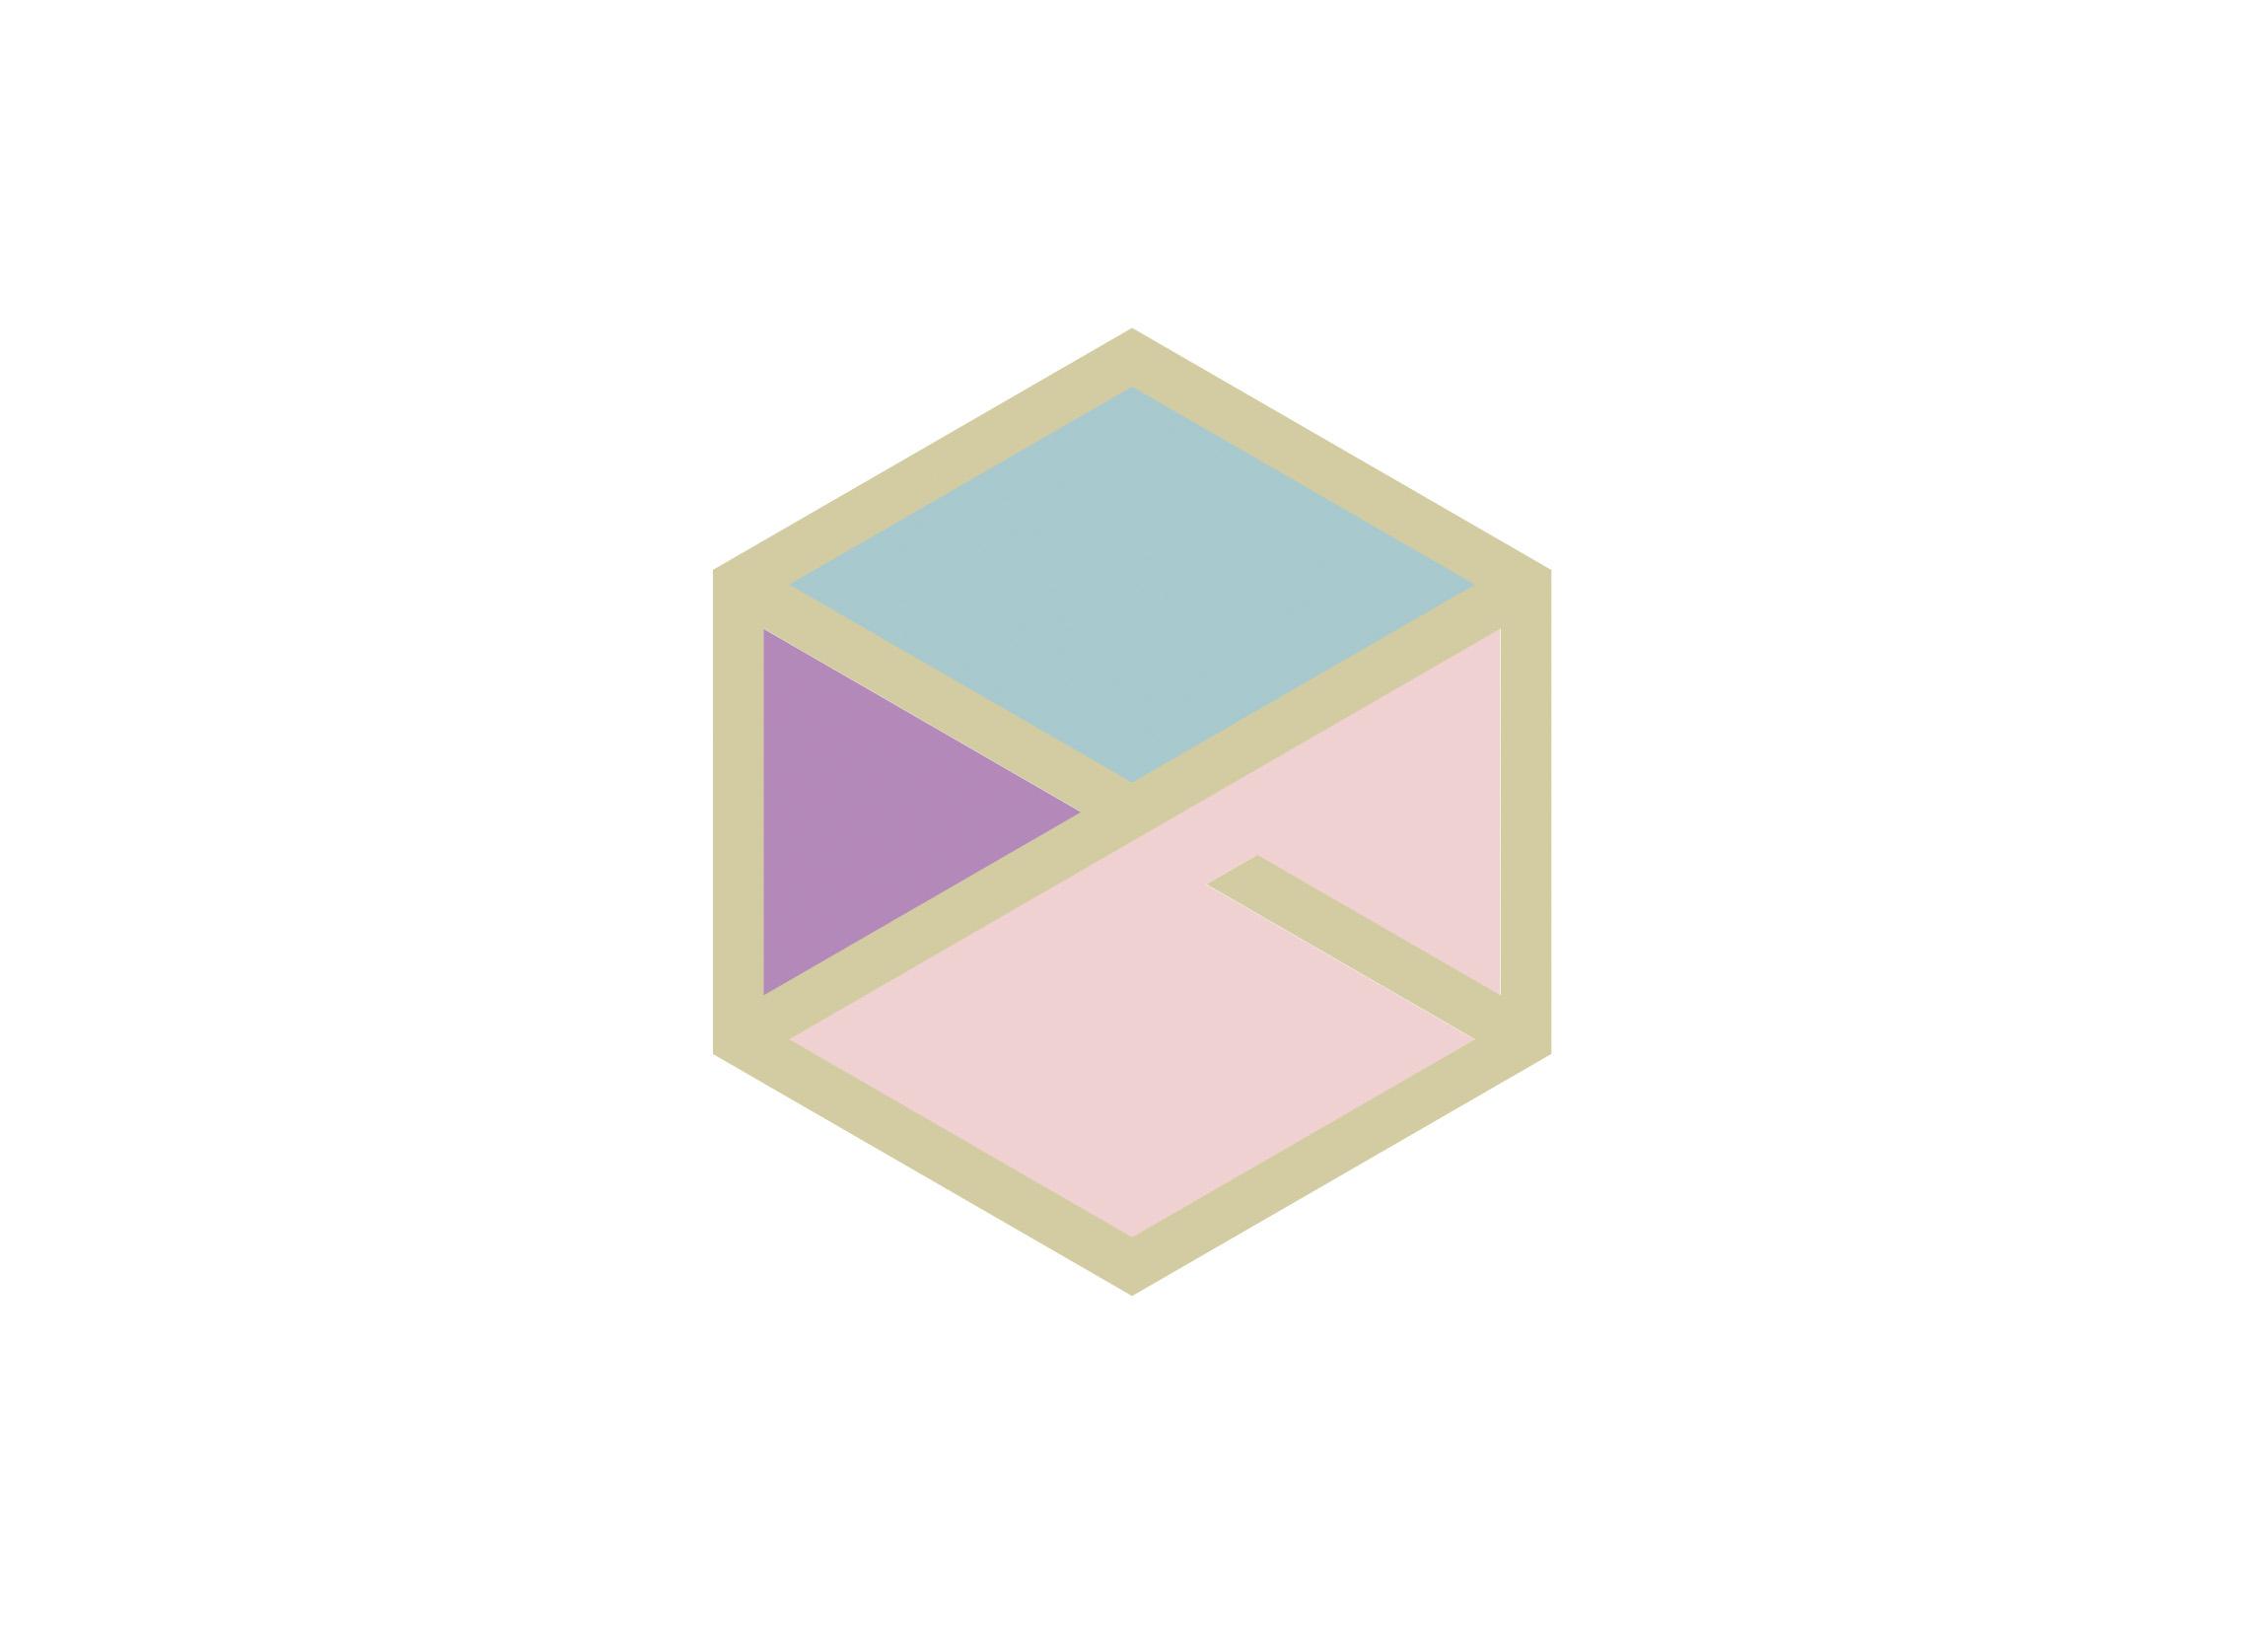 Rosara_Logos03.jpg